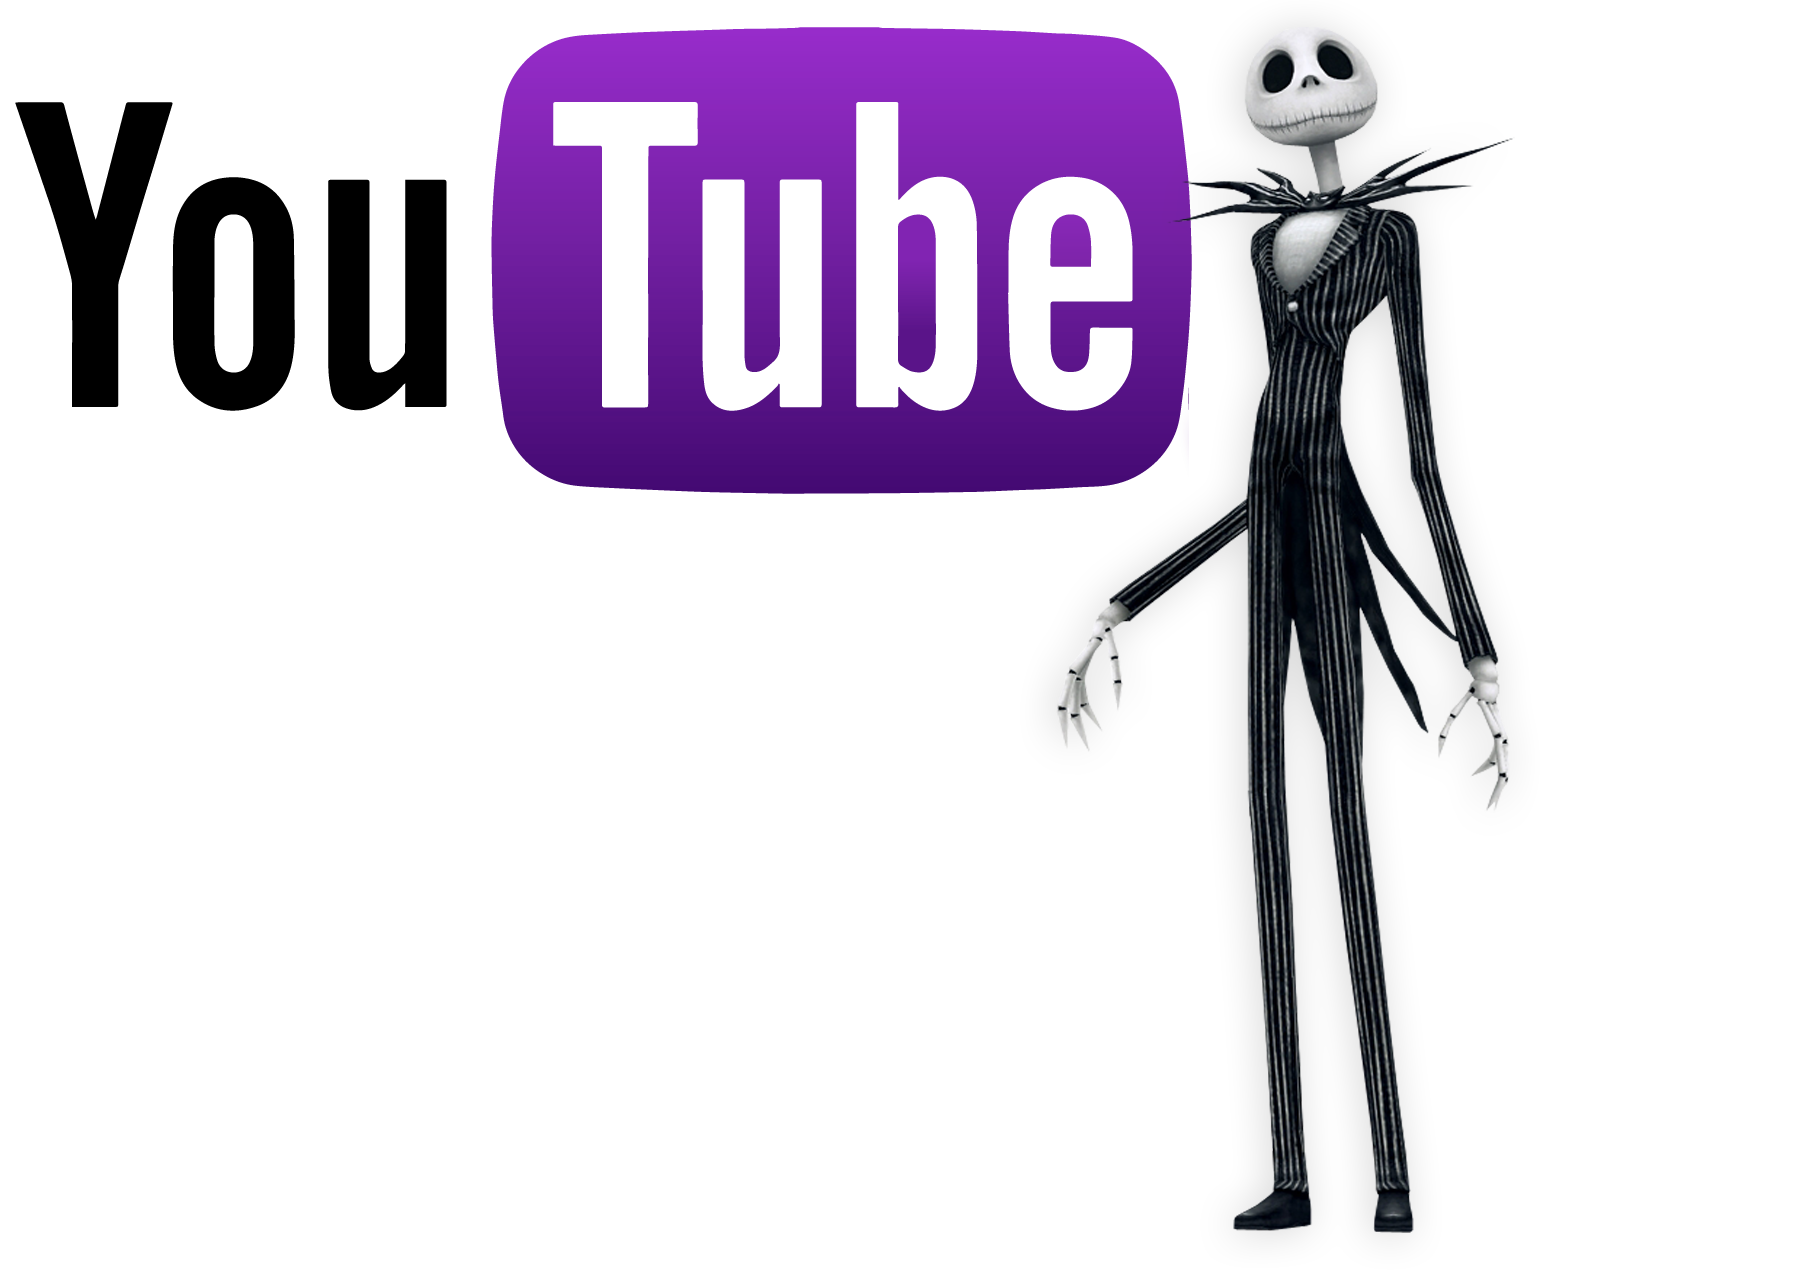 My actual youtube logo Youtube Script by MuuseDesign